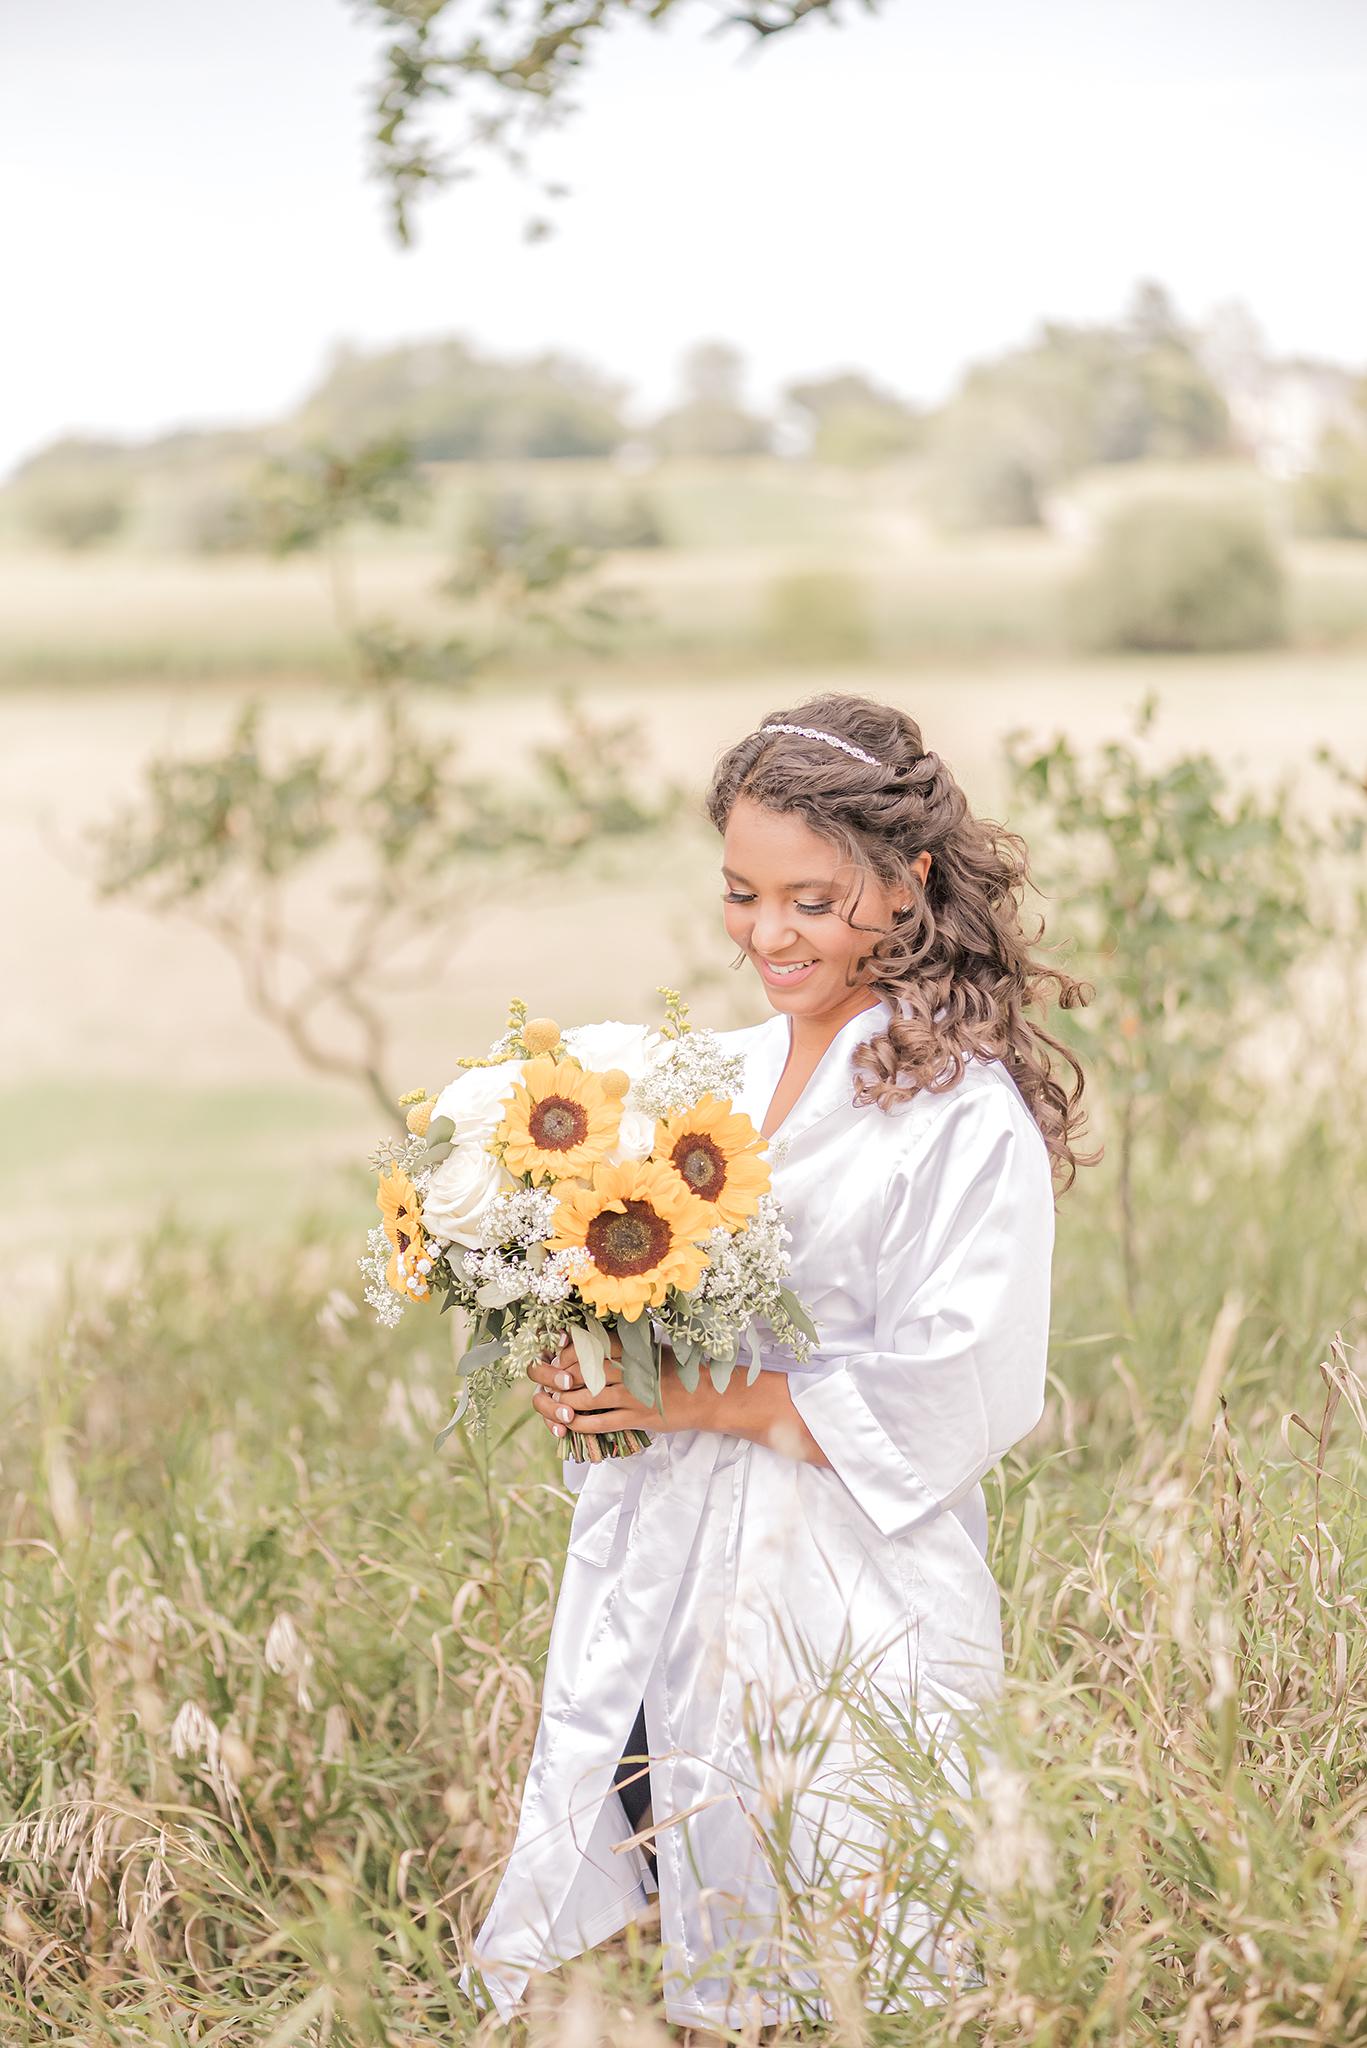 Lindsay-Adkins-Photography-Michigan-Wedding-Photographer-Wind-Hill-Farm-10